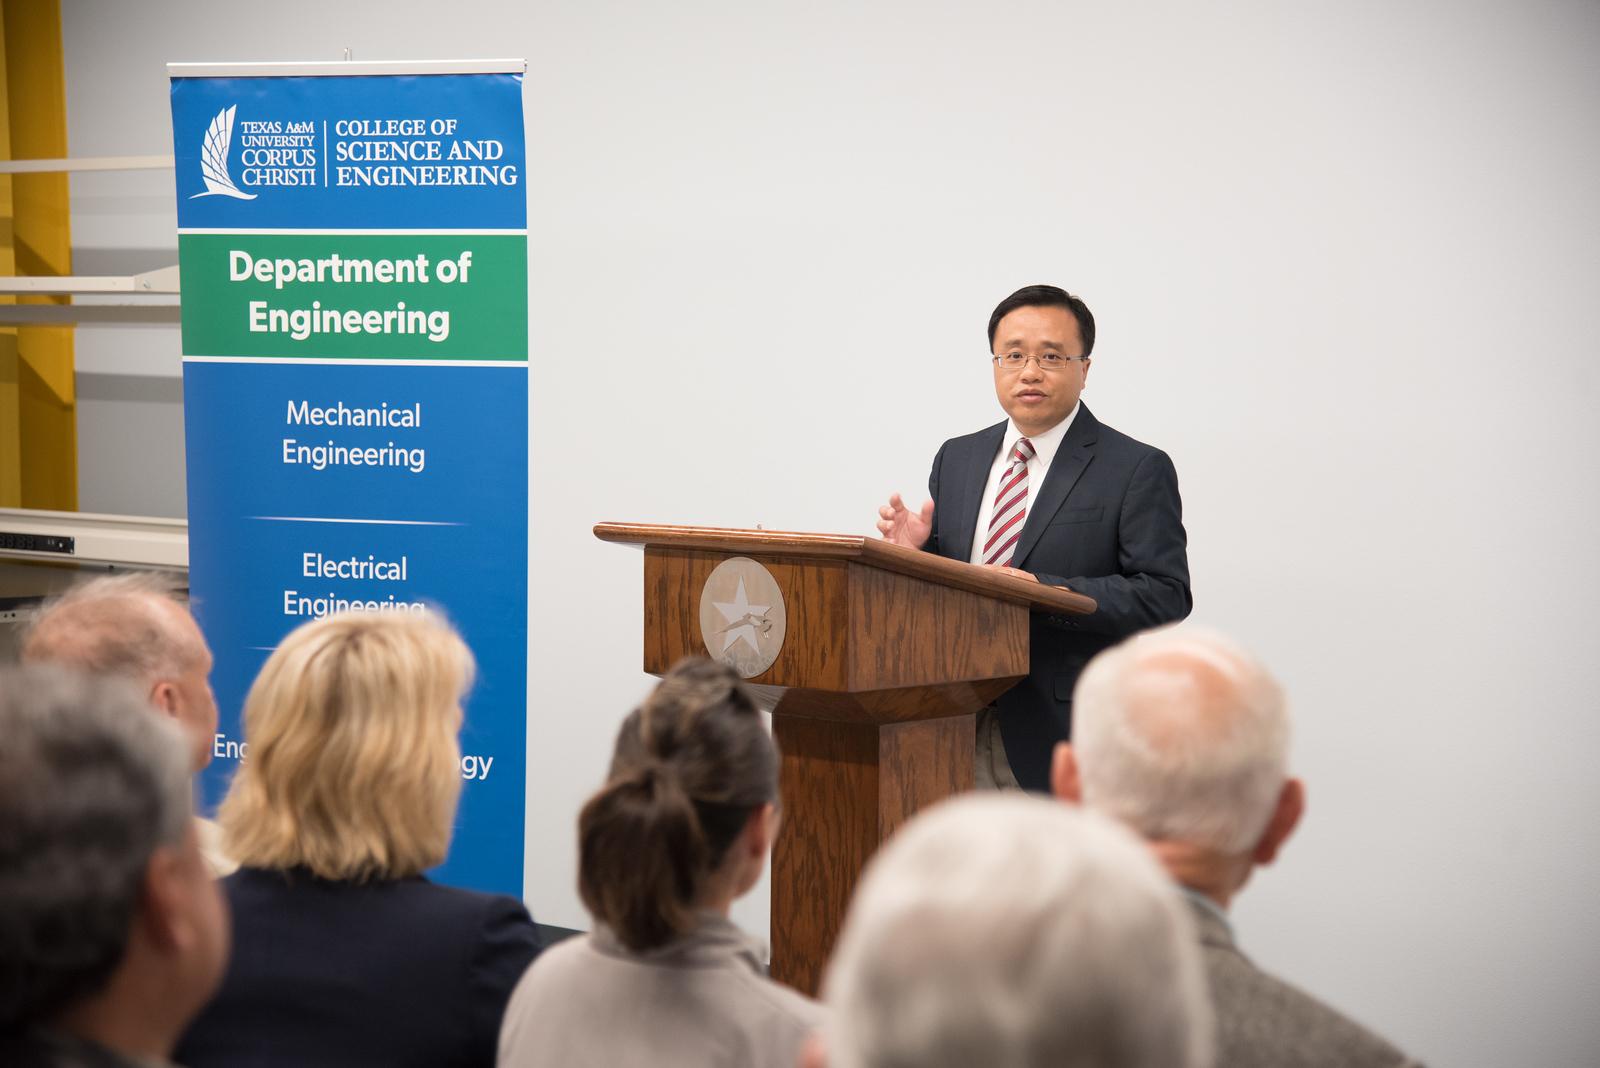 Dr. Hua Zhang Assistan Profesor of Engineering